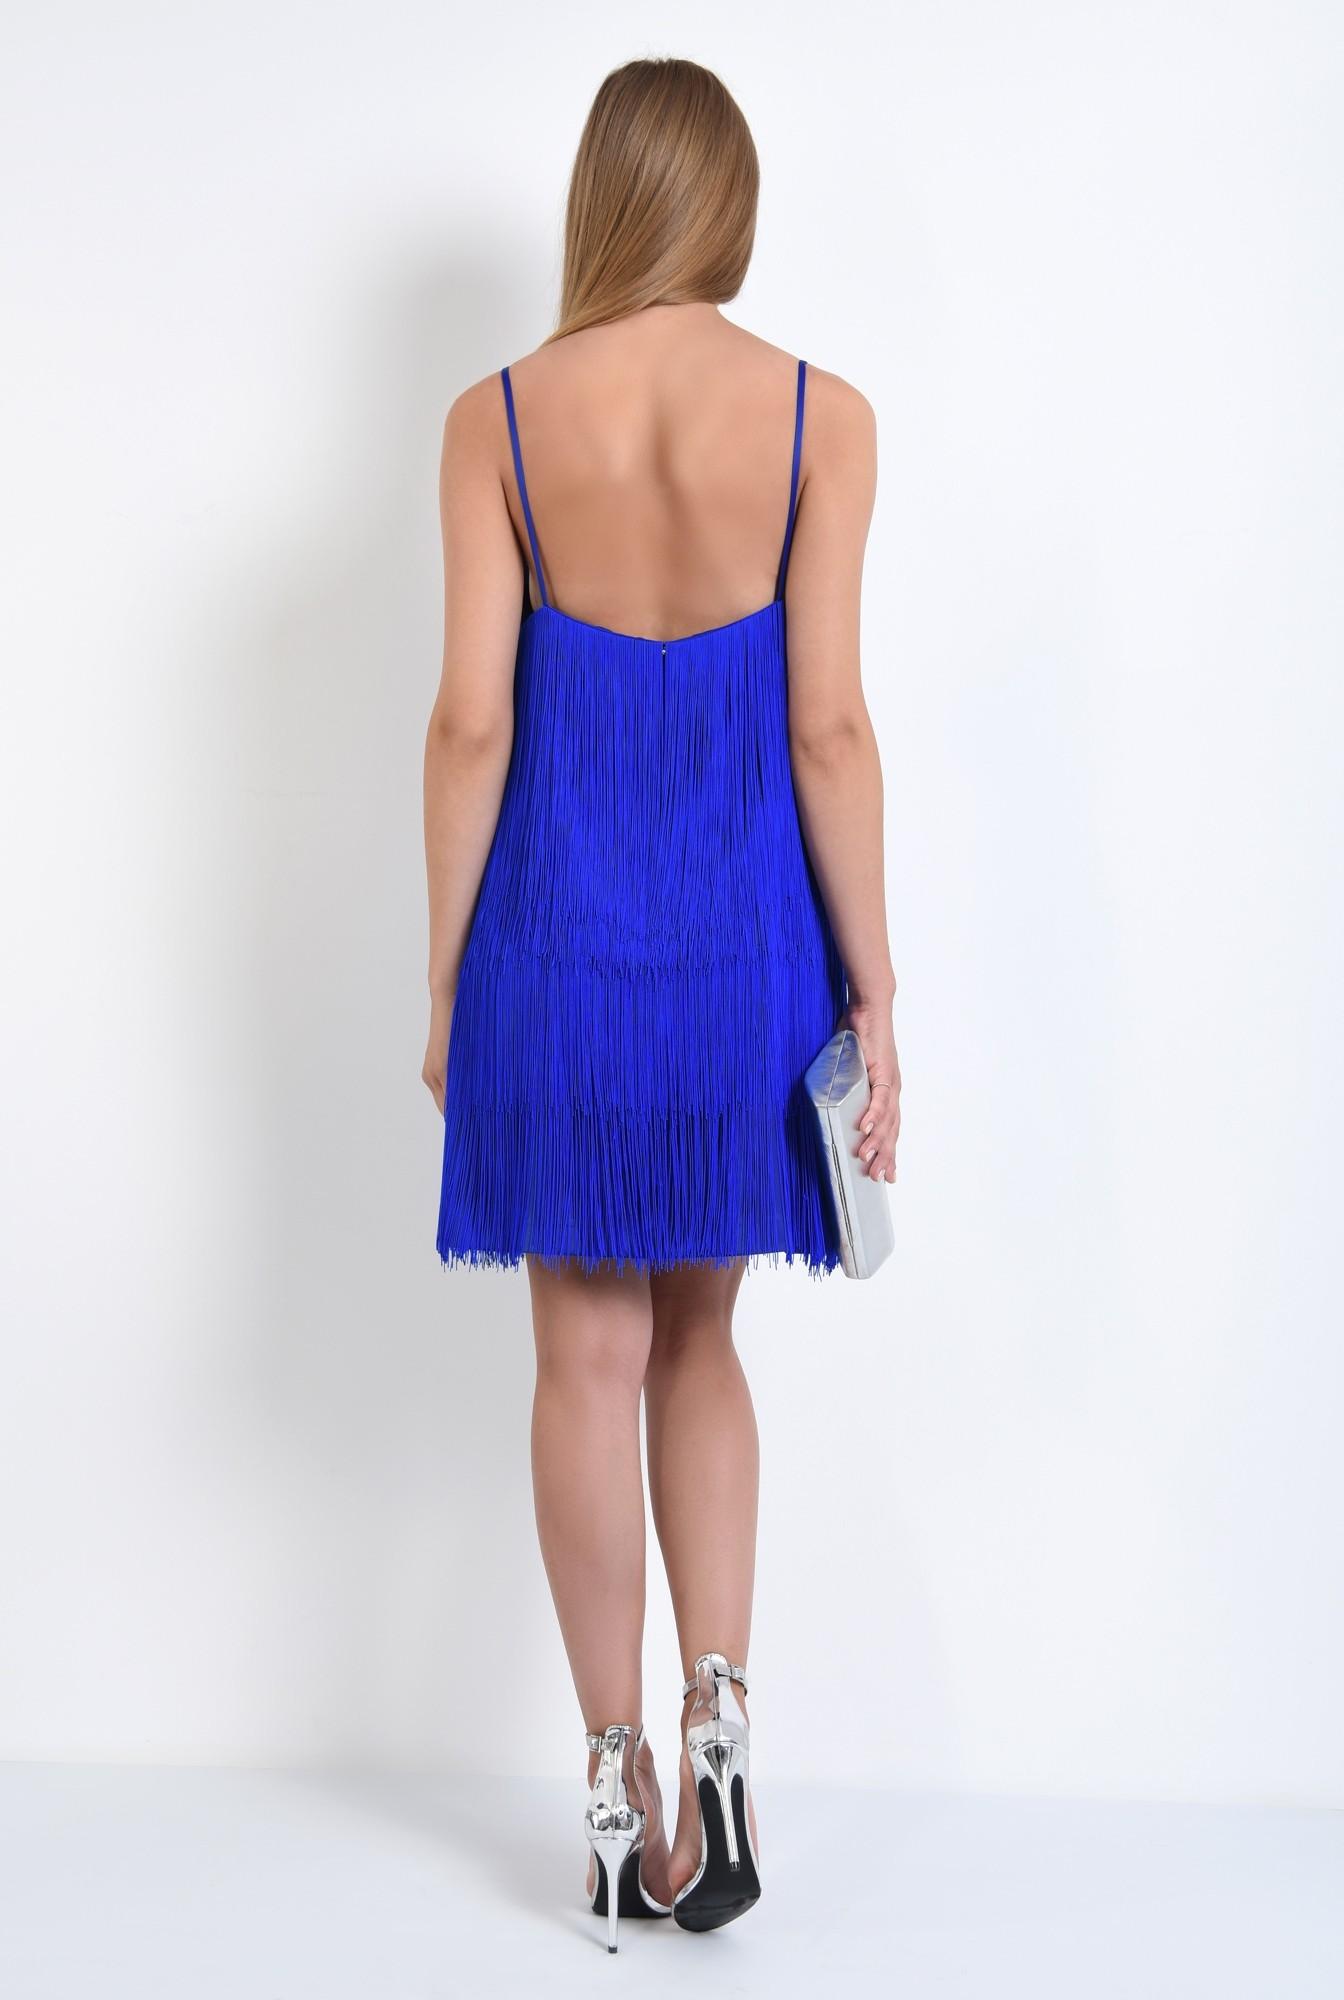 1 - 360 - rochie de seara albastra, cu frajuri, slip on, croi drept, anchior